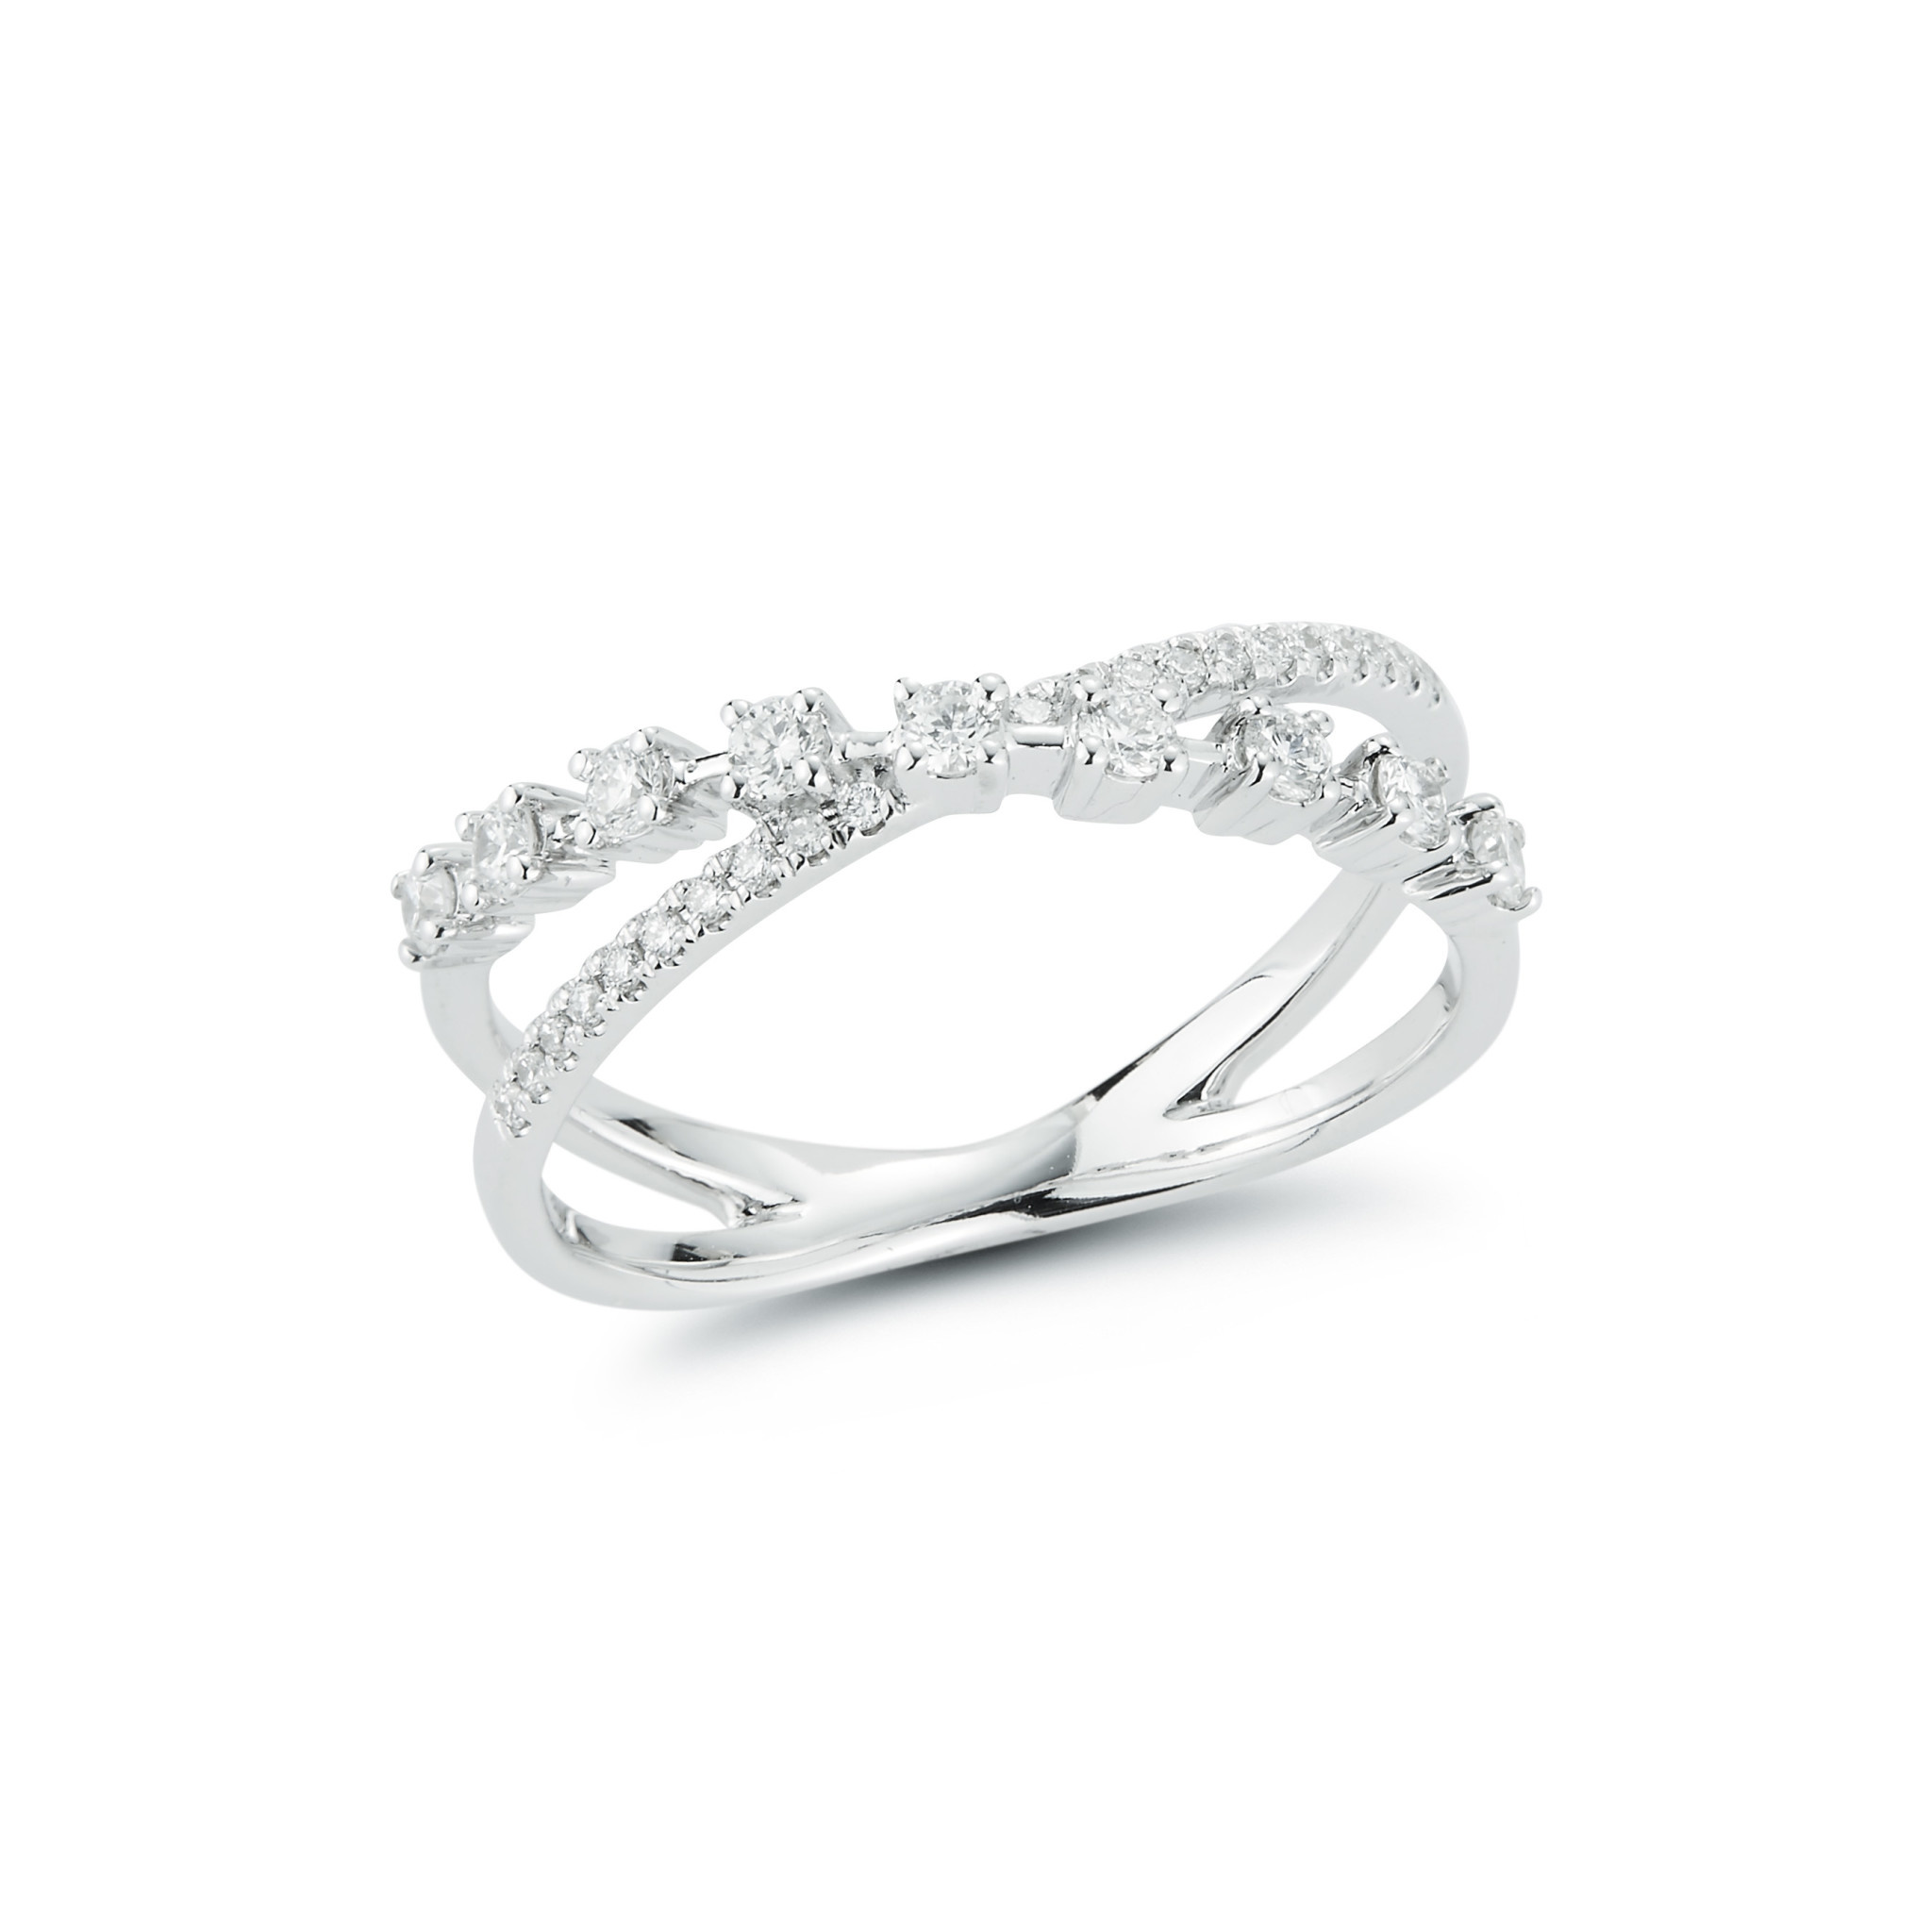 Dana Rebecca Ava Bea Cross Over Diamond White Gold Ring